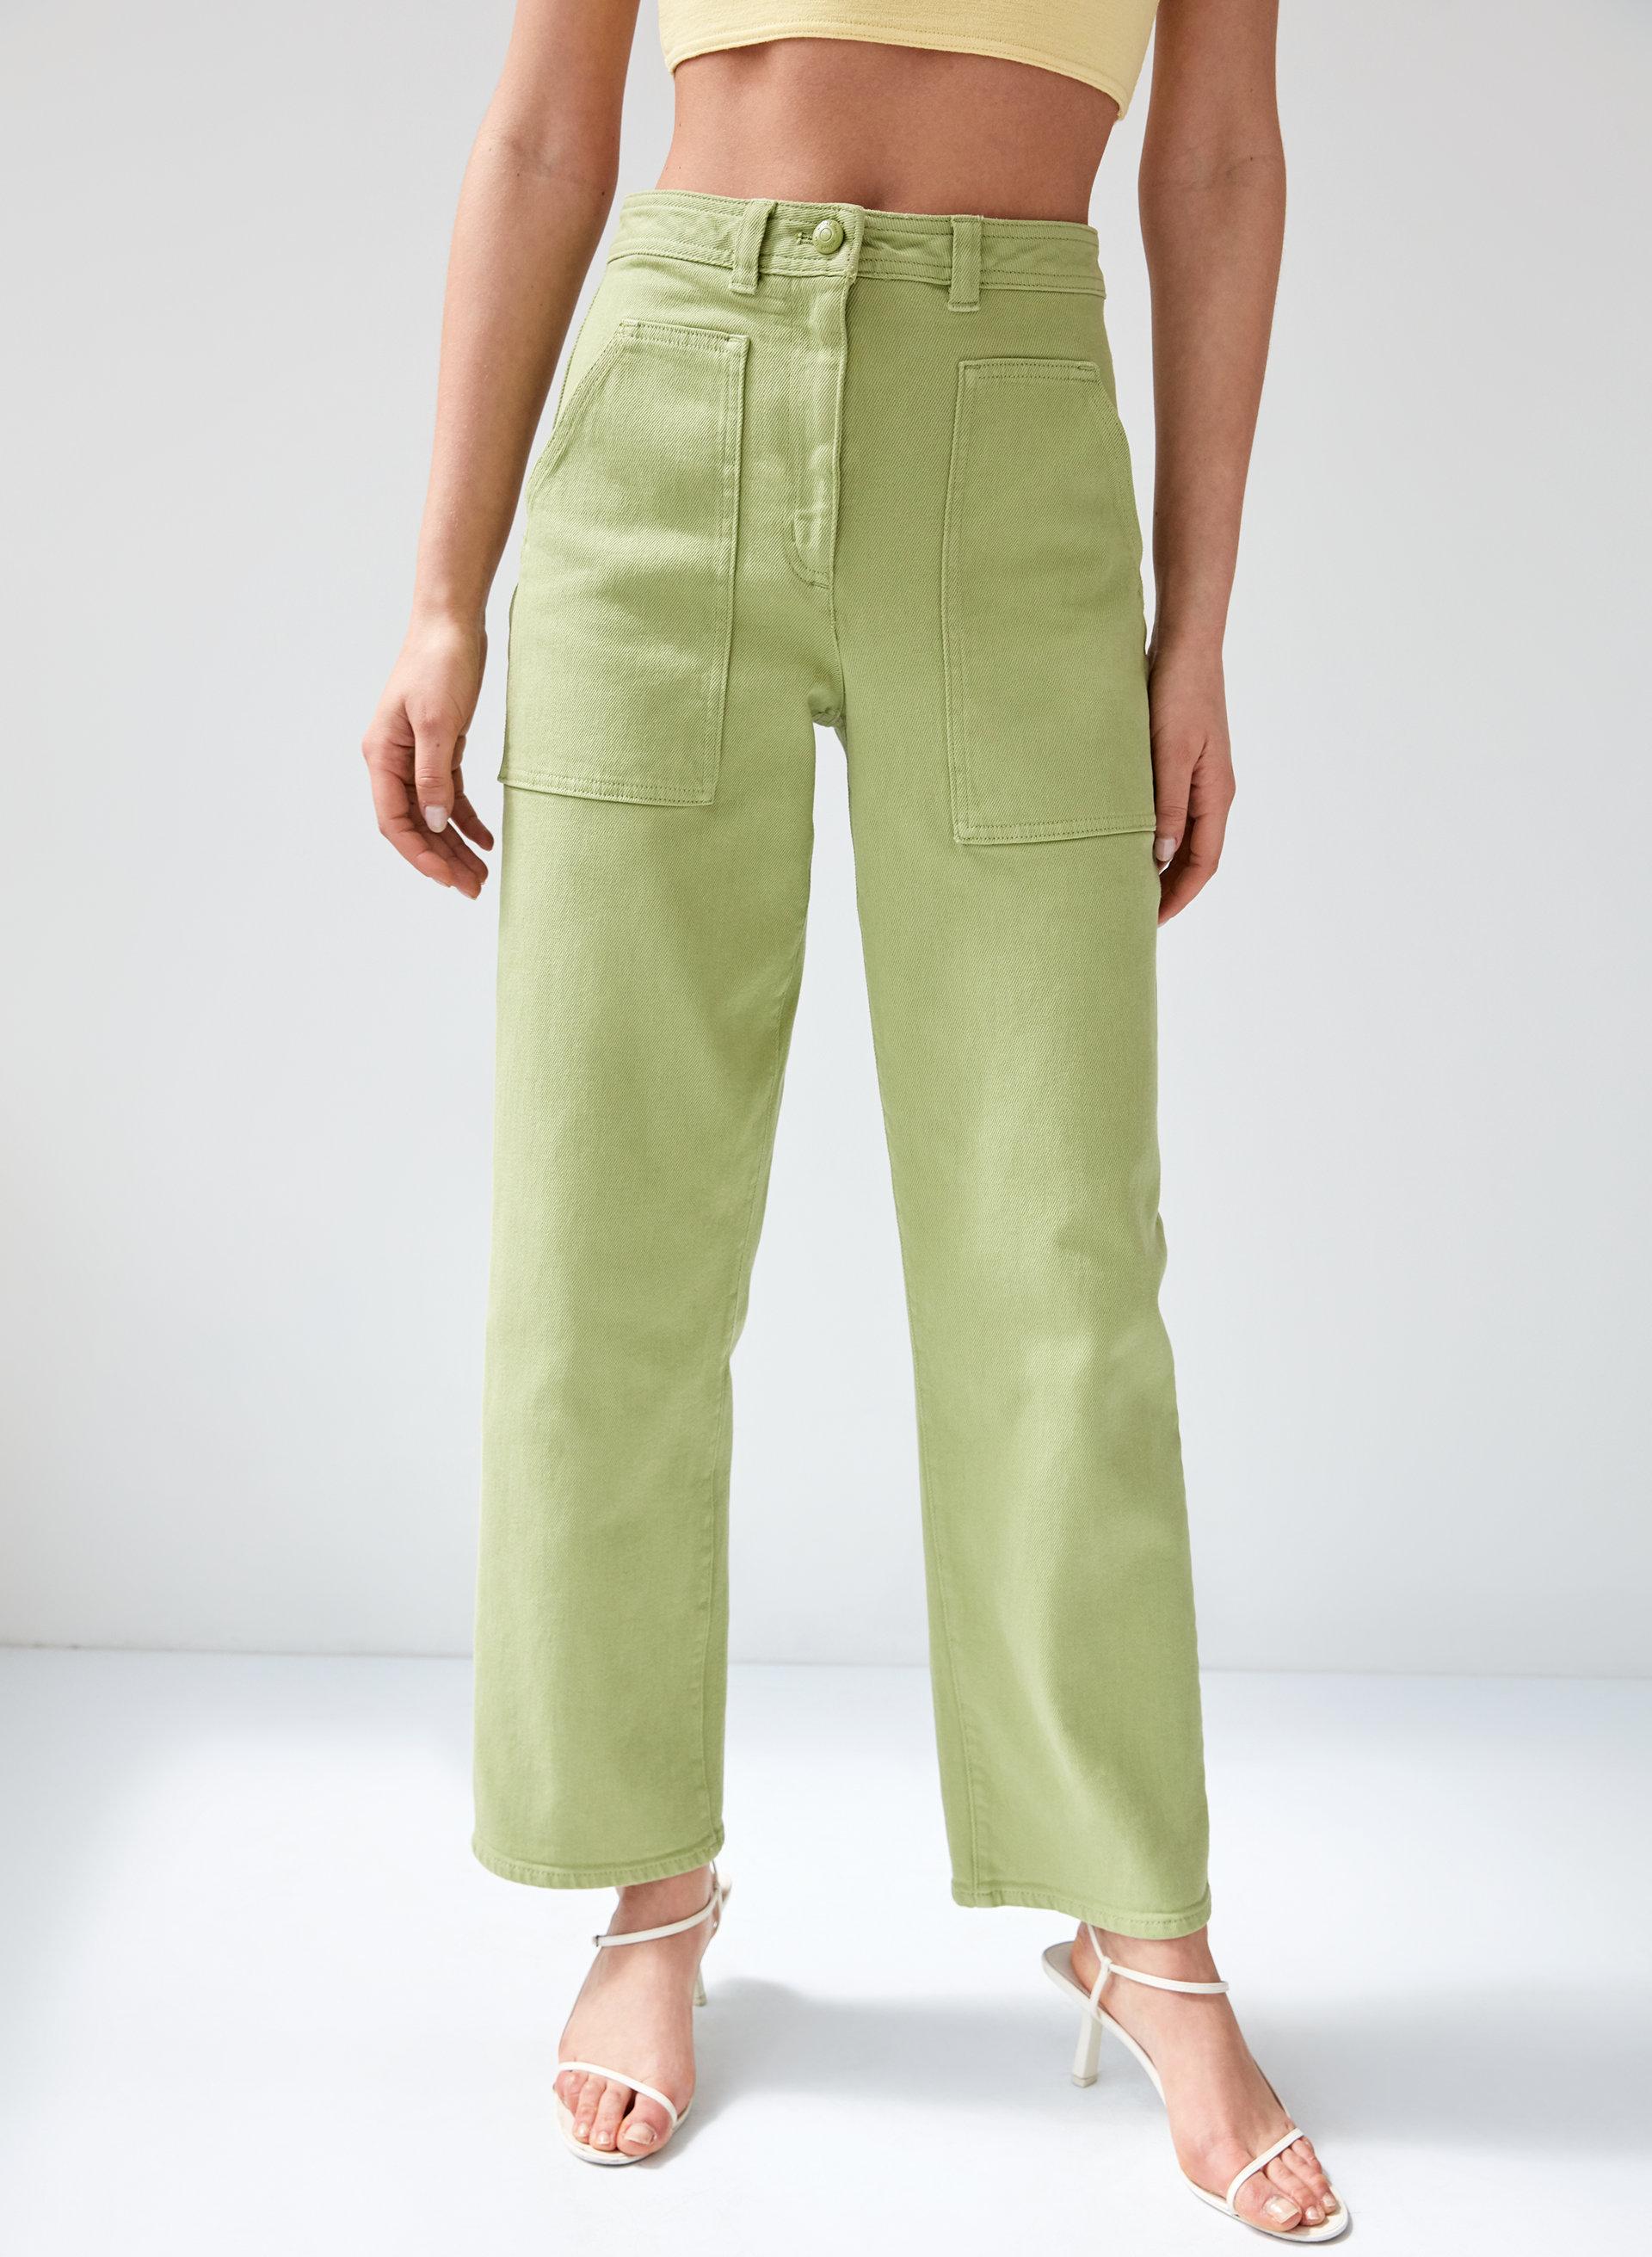 c4caa405 RYLEY PANT - High-waisted, utilitarian pant